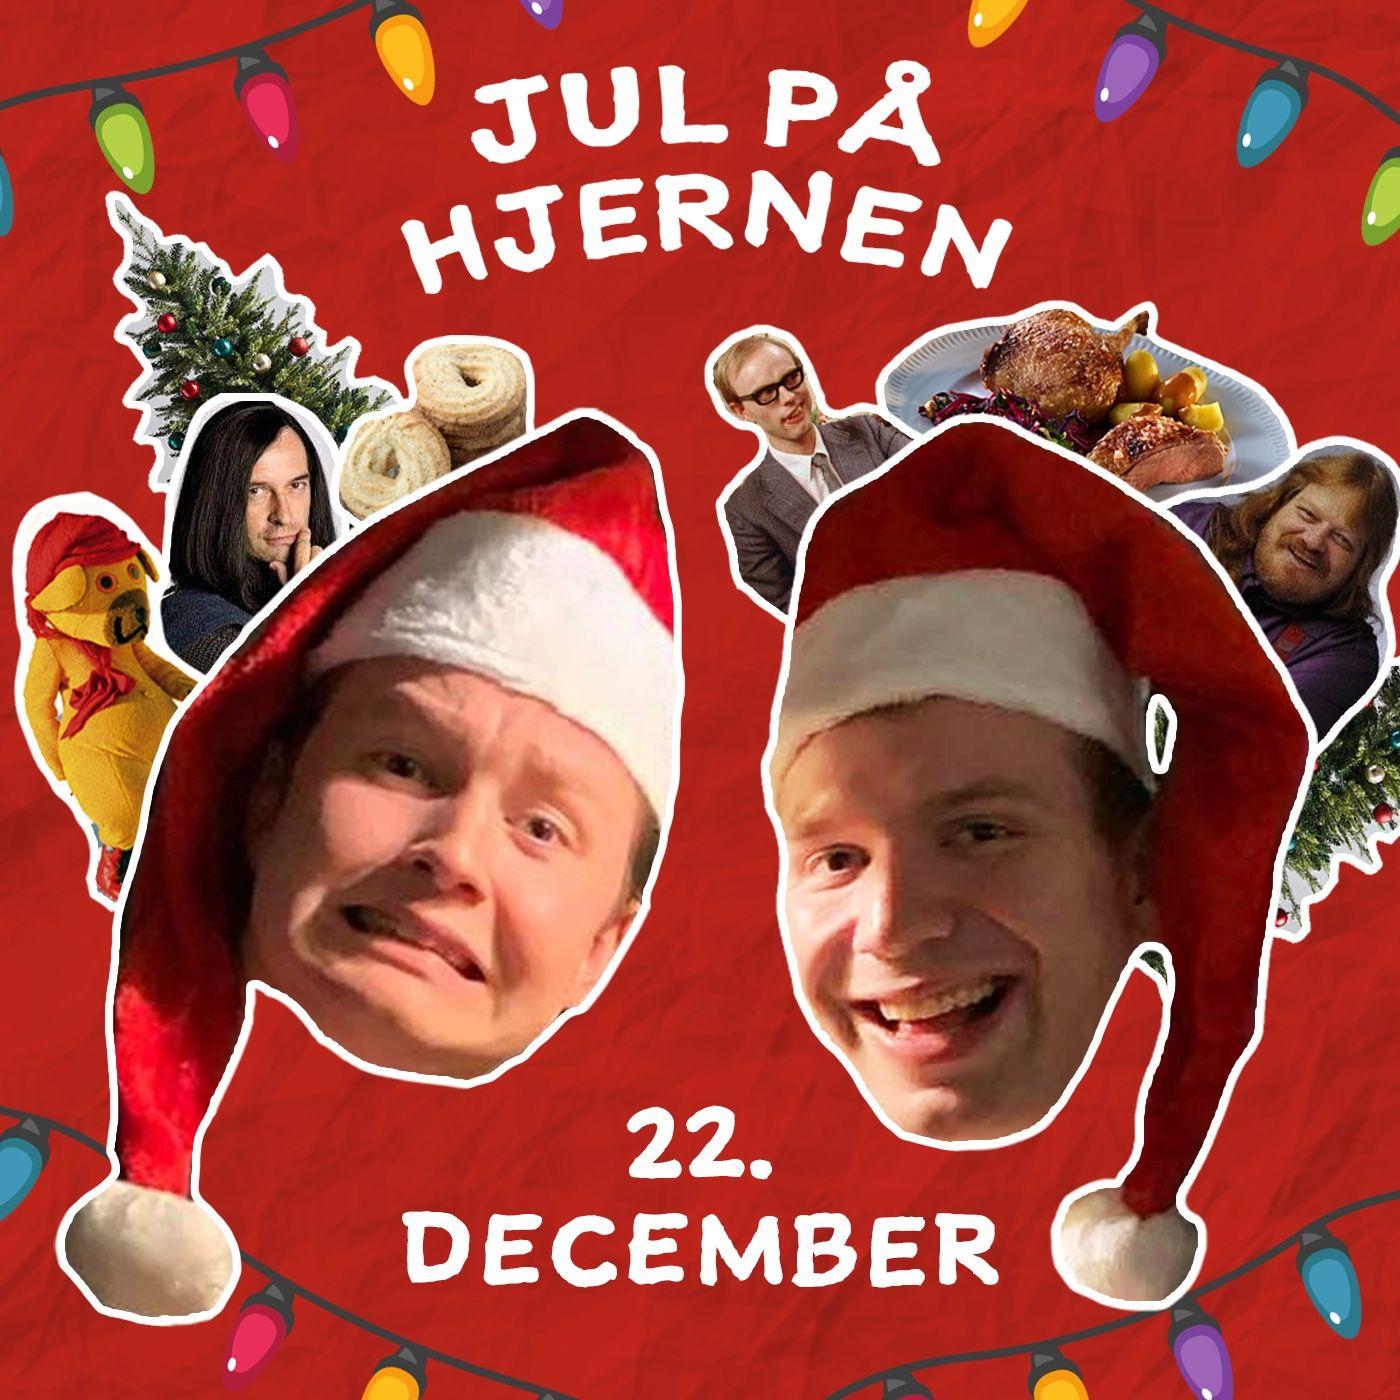 22. december - Jul på hjernen